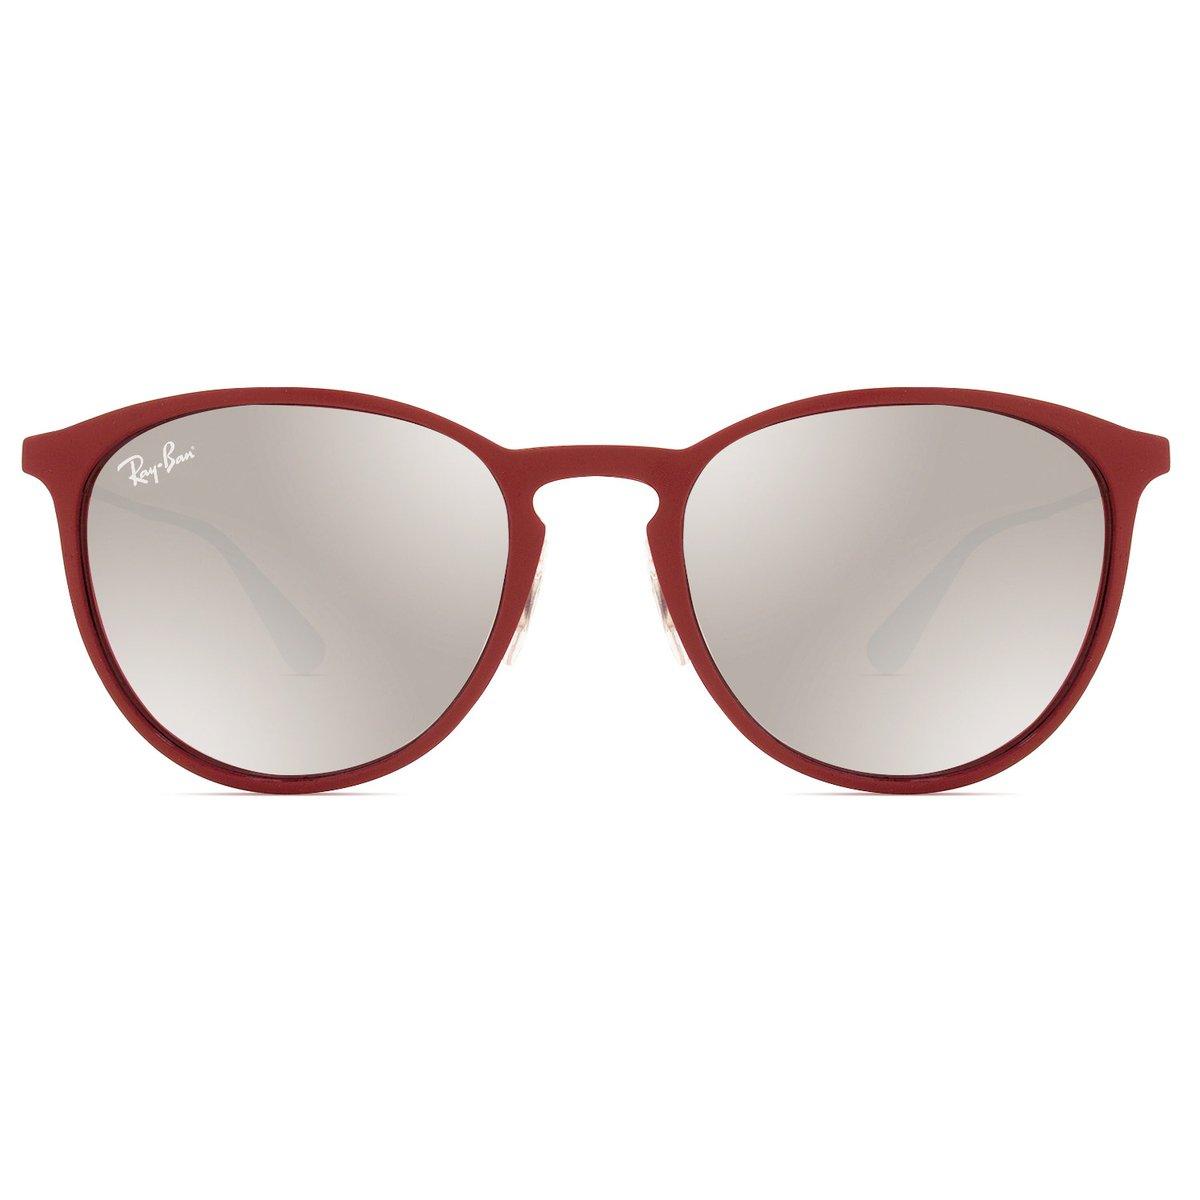 272c9ddac6c45 Óculos de Sol Ray Ban Erika Metal RB3539 9023 B5-54 Feminino - Compre Agora    Netshoes